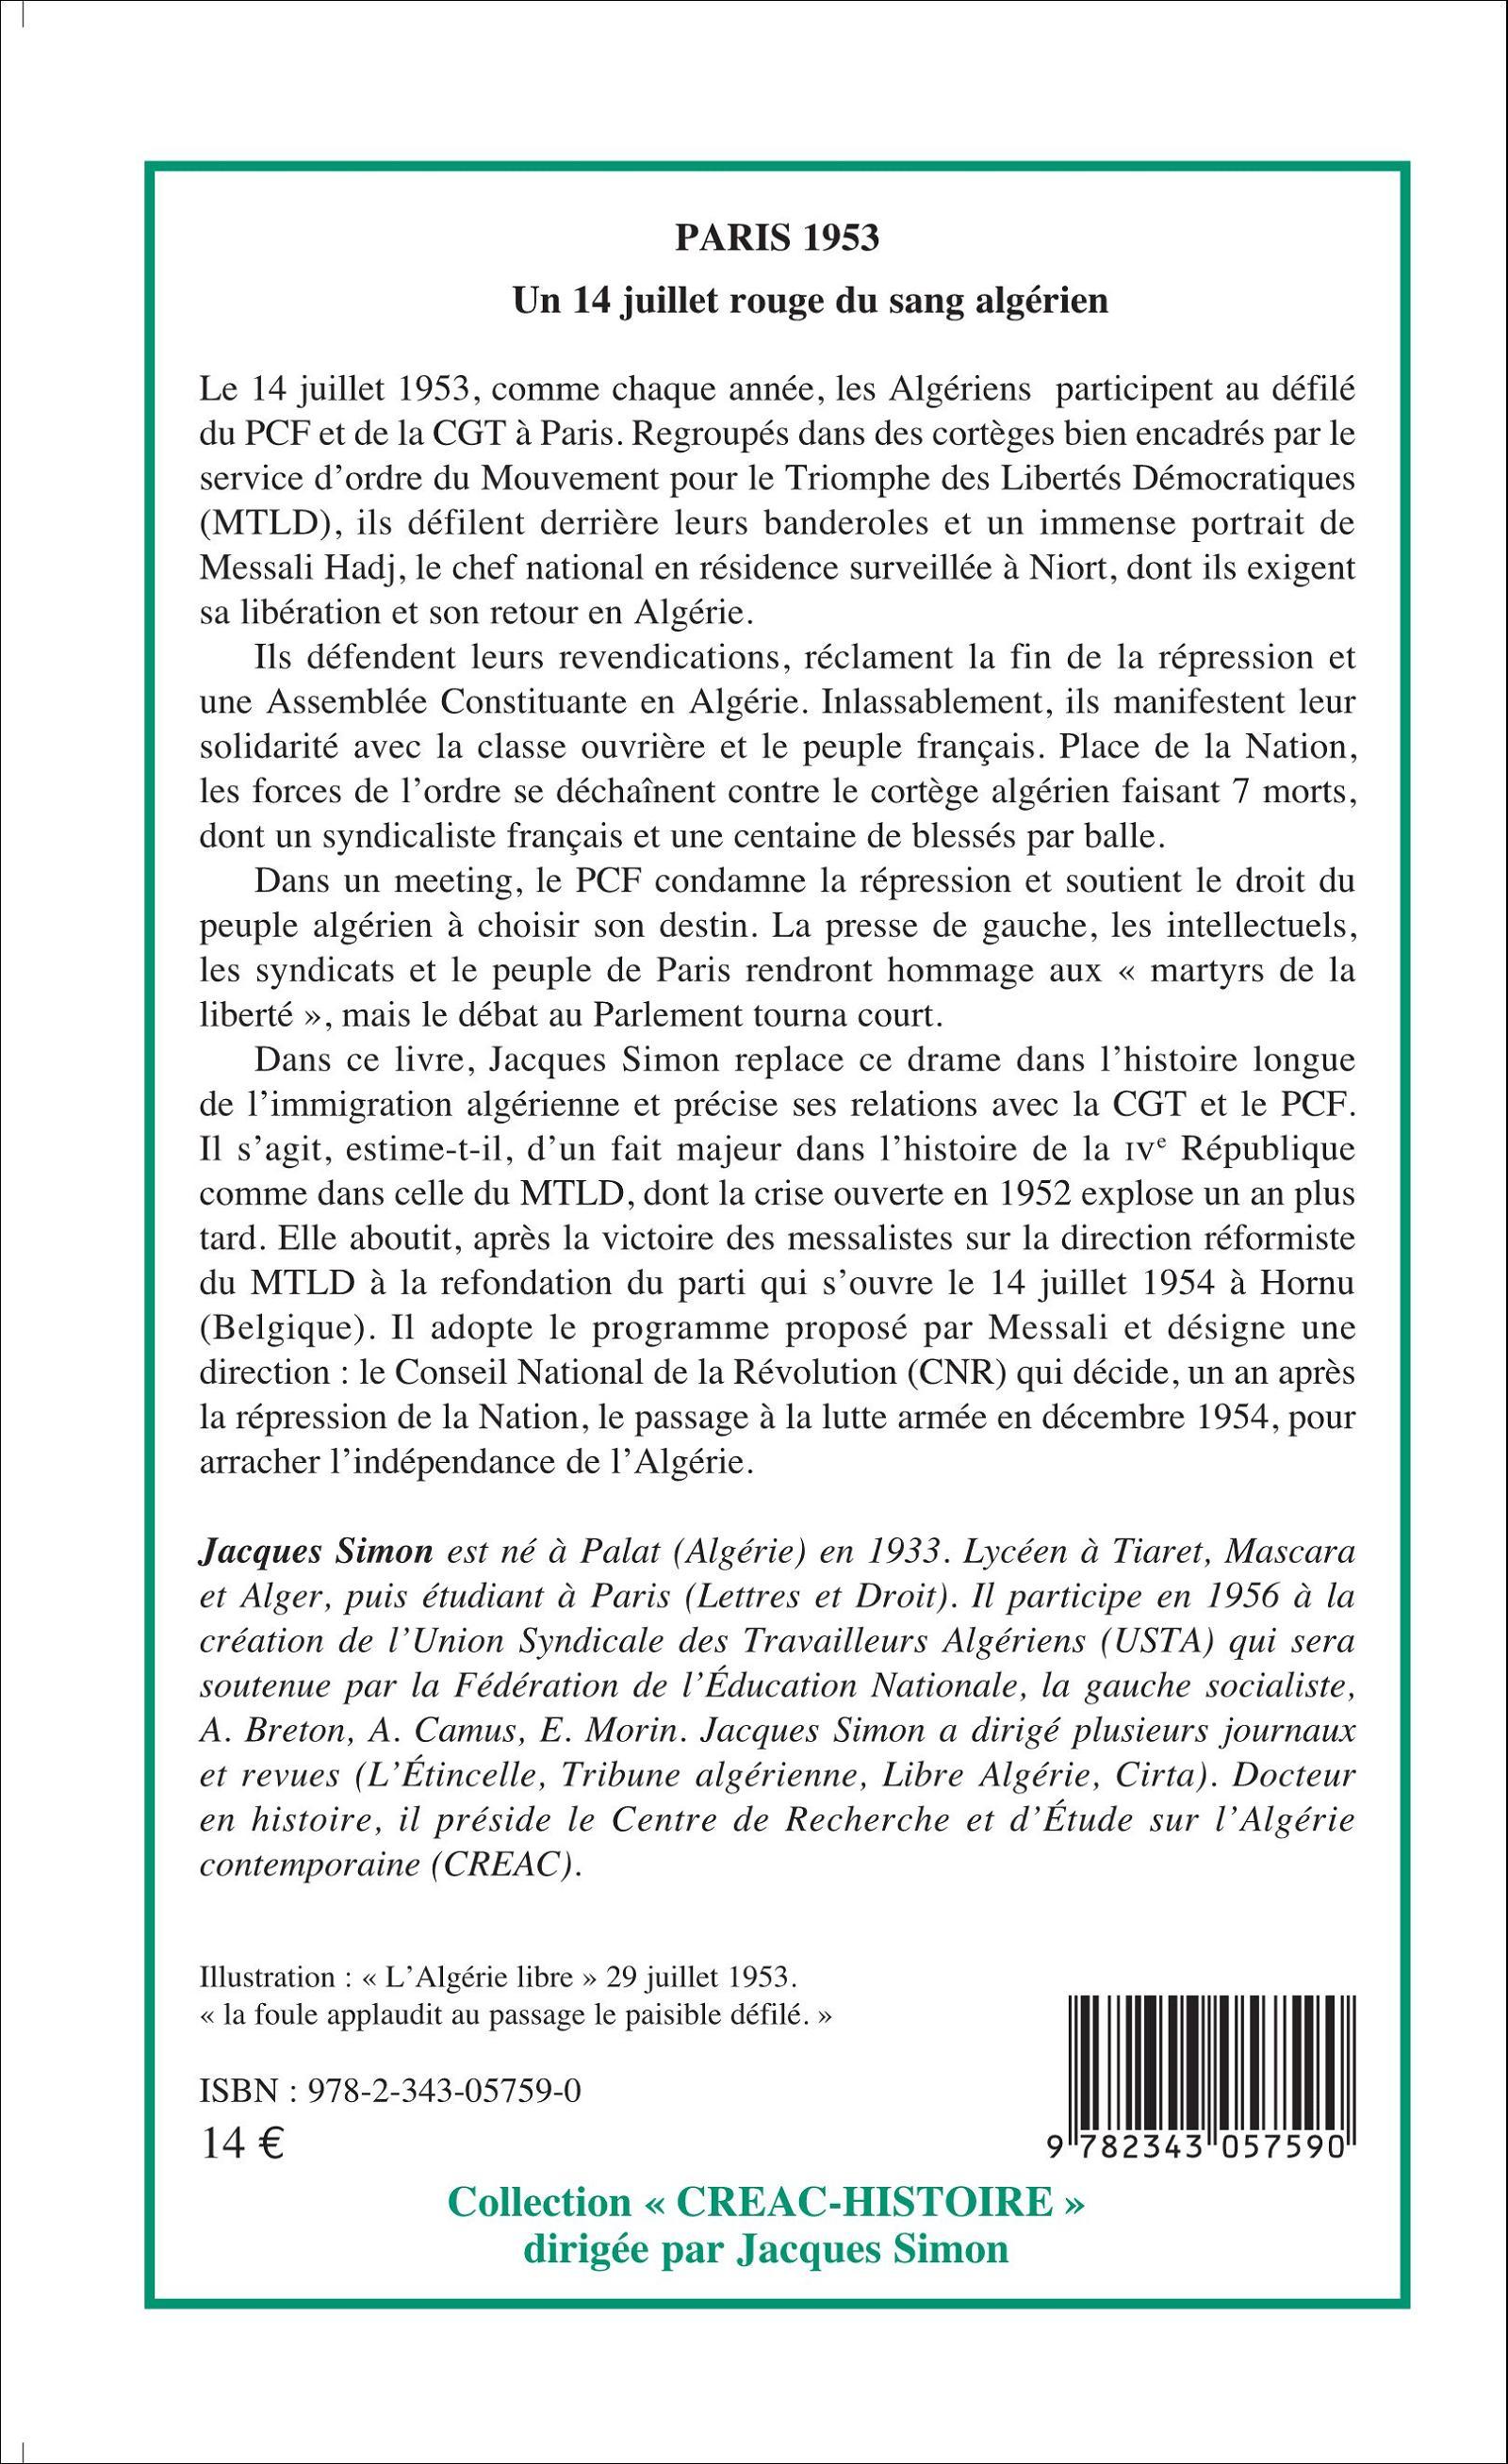 http://www.editions-harmattan.fr/catalogue/couv/9782343057590v.jpg